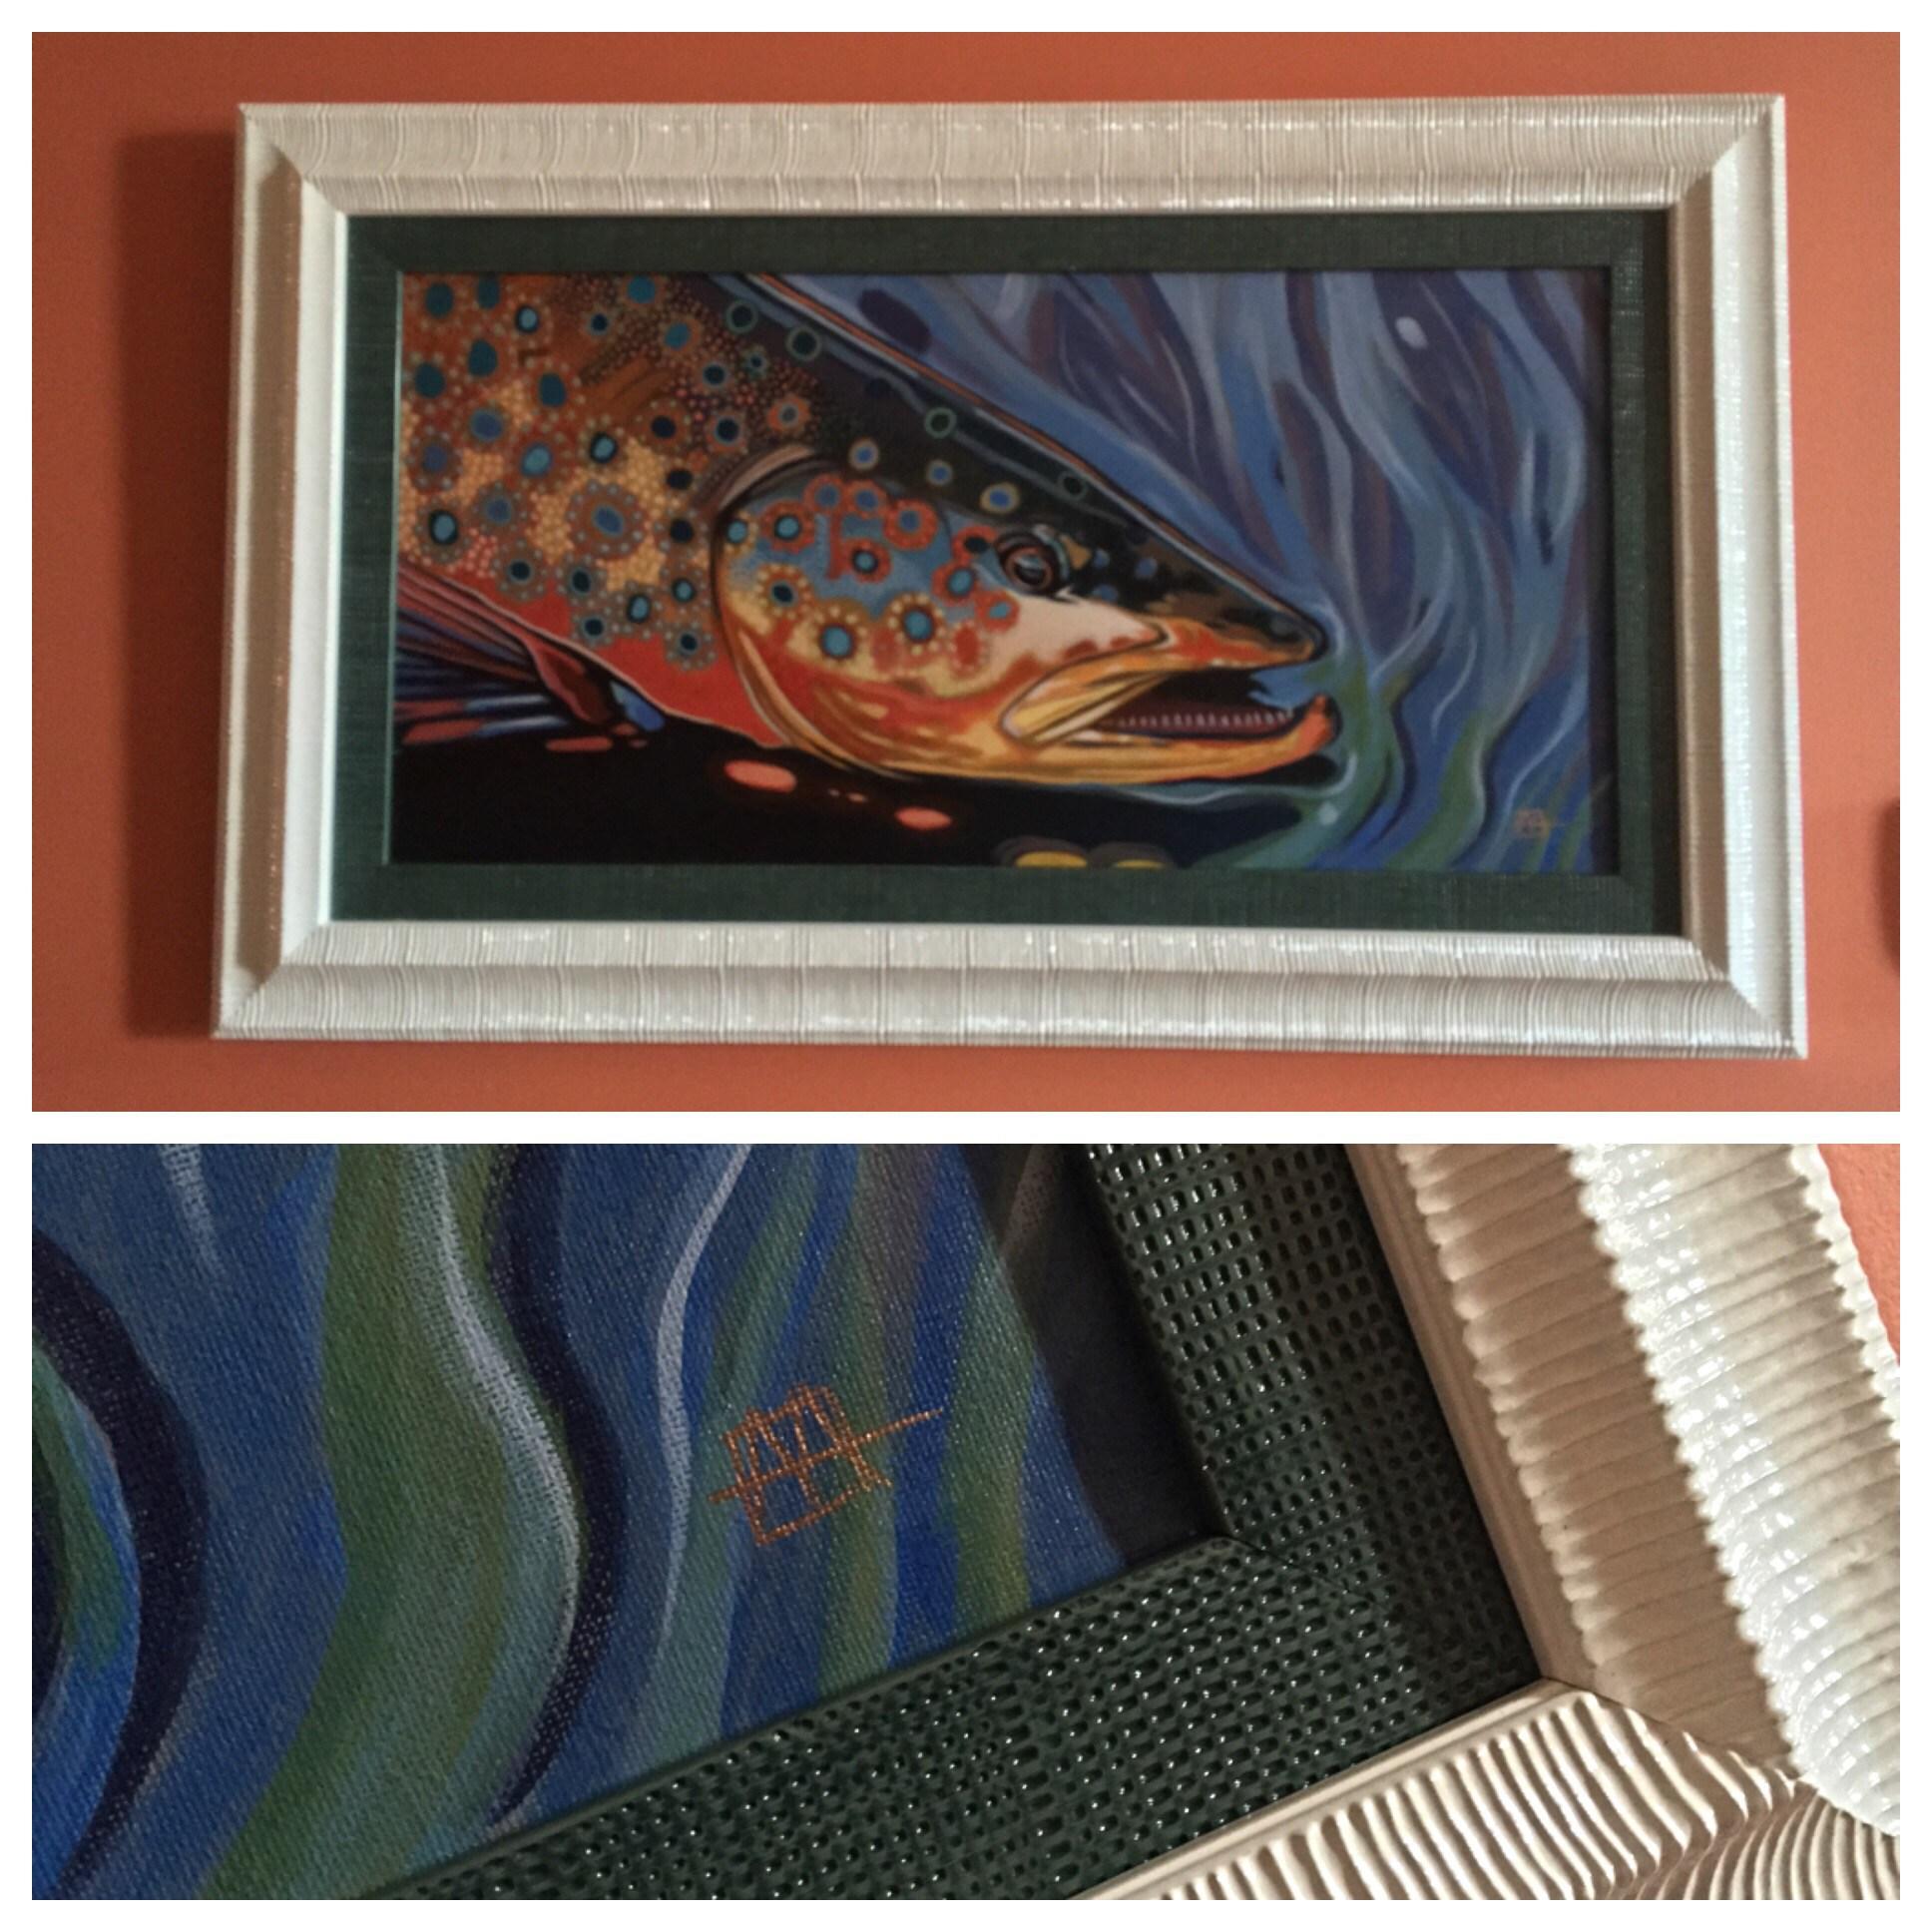 gallery_293_anthony_anastor_original_rainbow_trout_framed.jpg